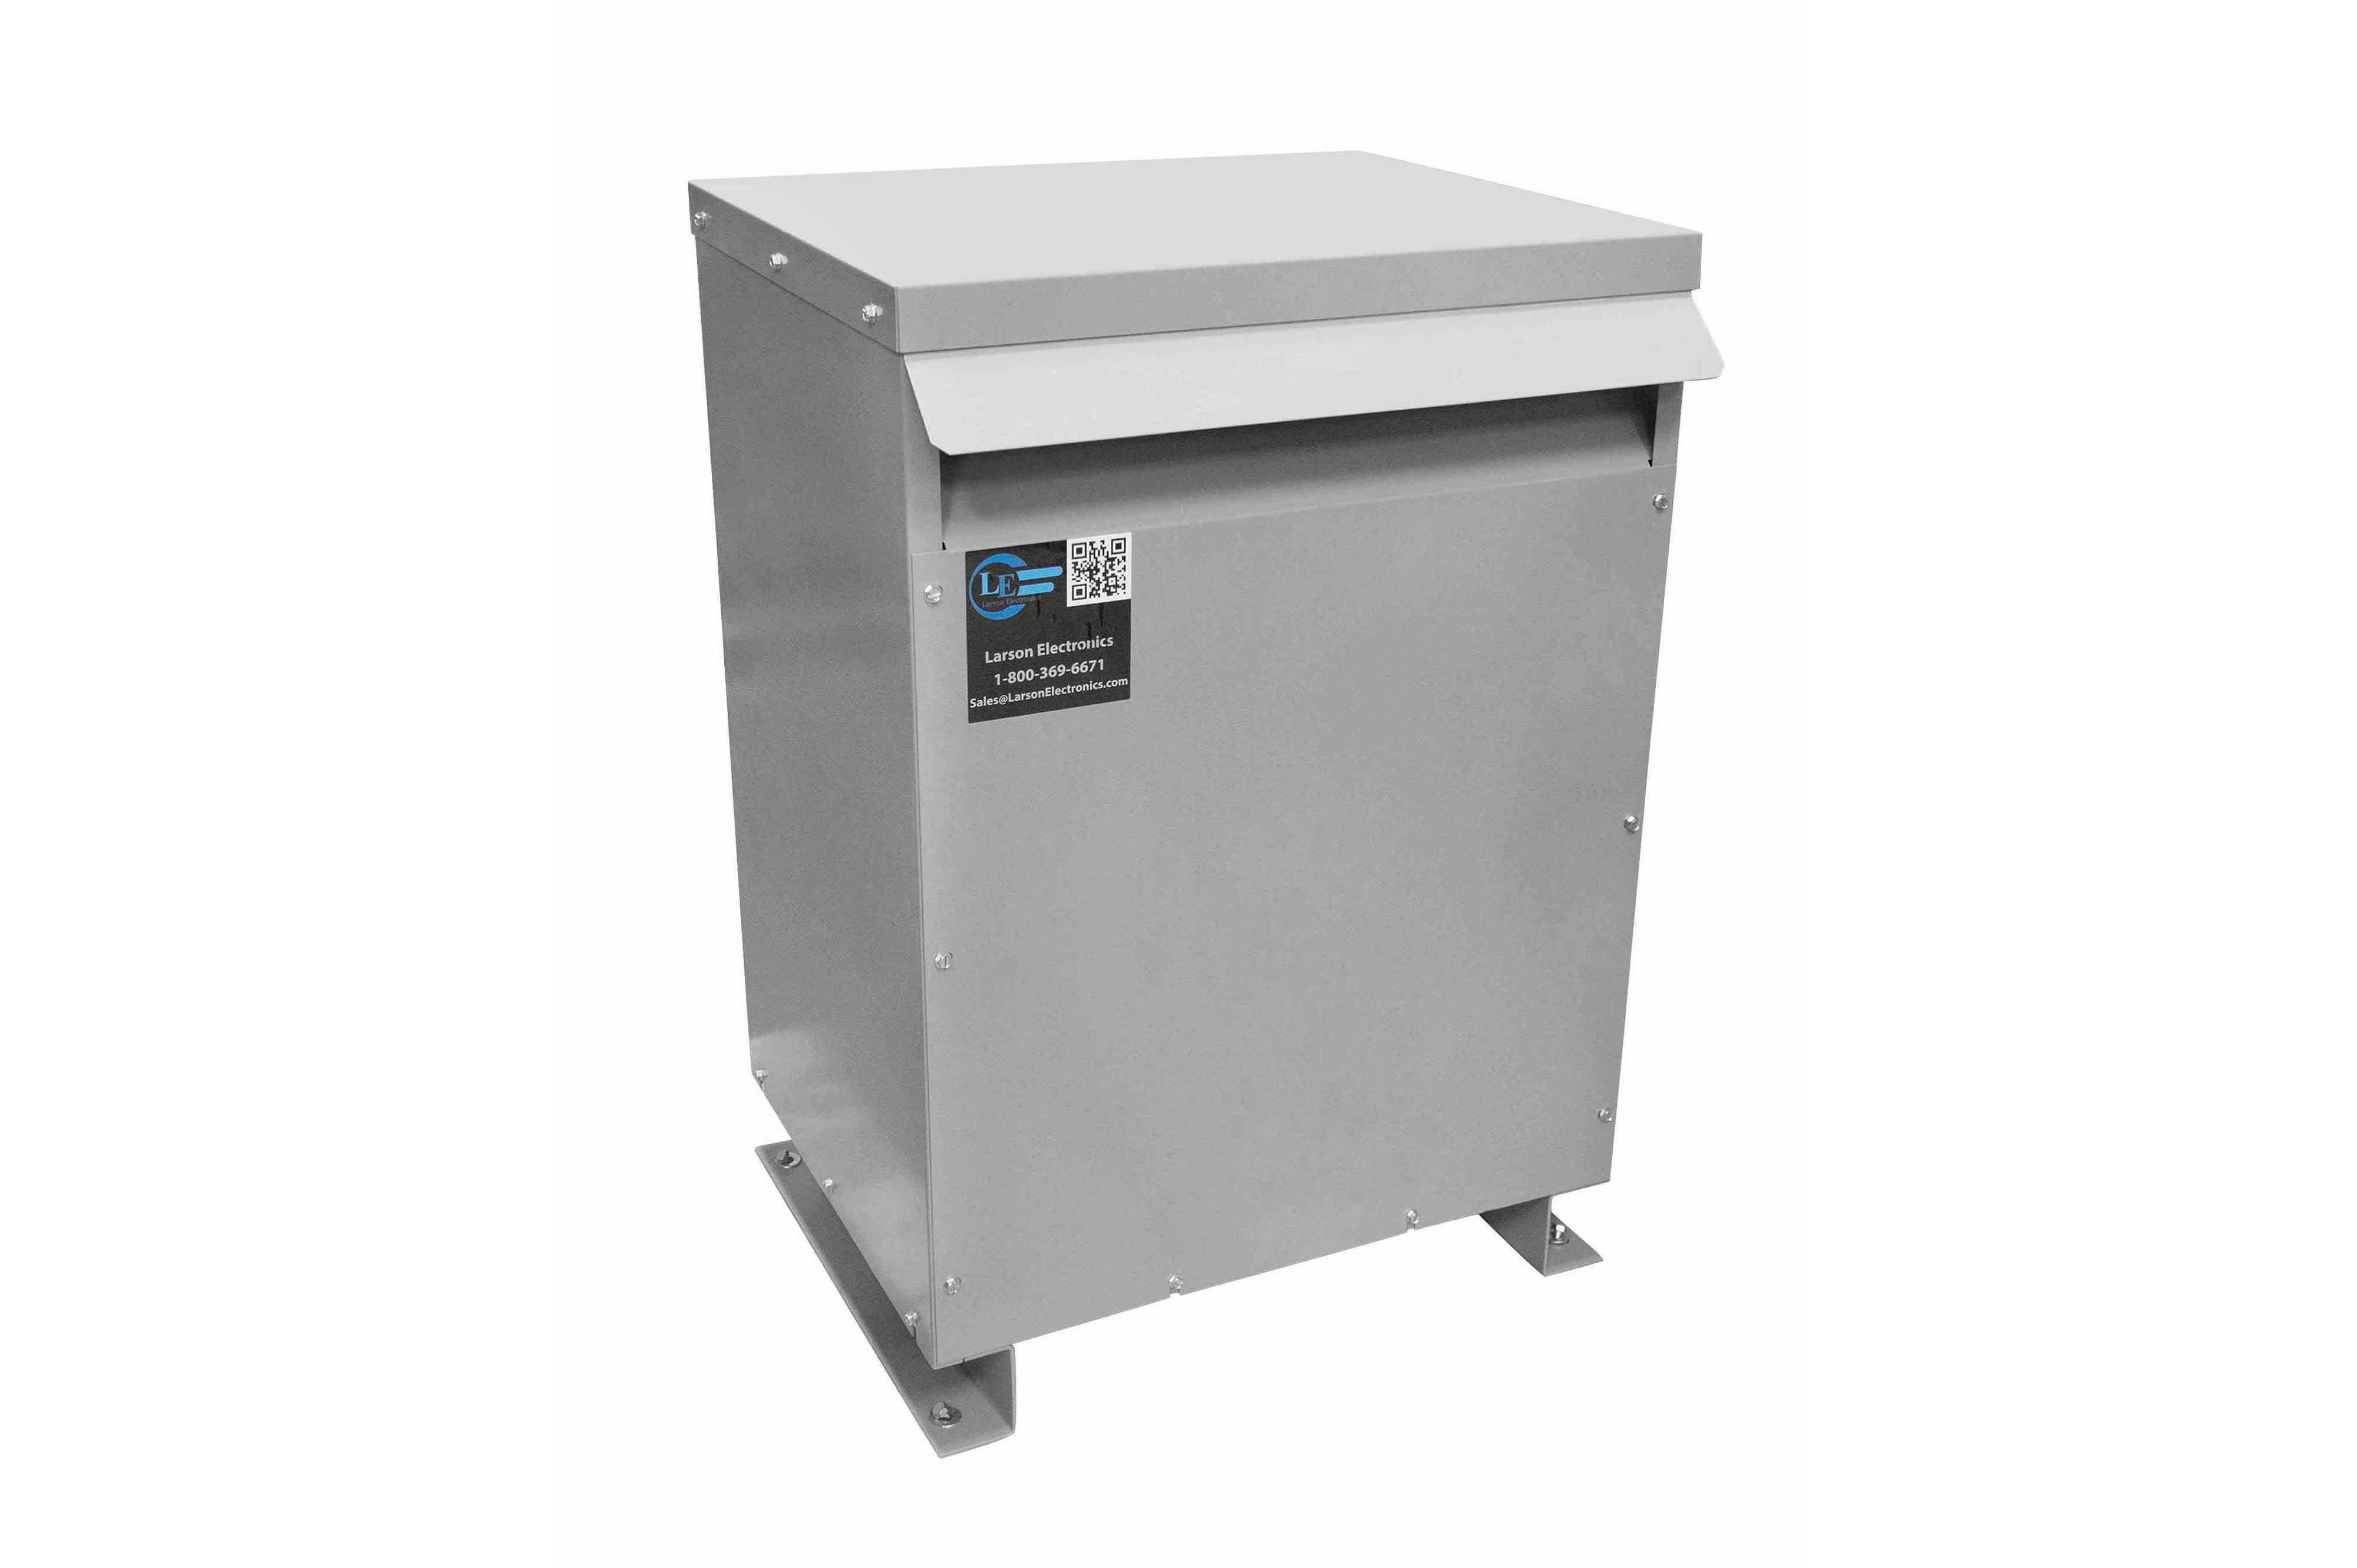 38 kVA 3PH Isolation Transformer, 380V Wye Primary, 600V Delta Secondary, N3R, Ventilated, 60 Hz